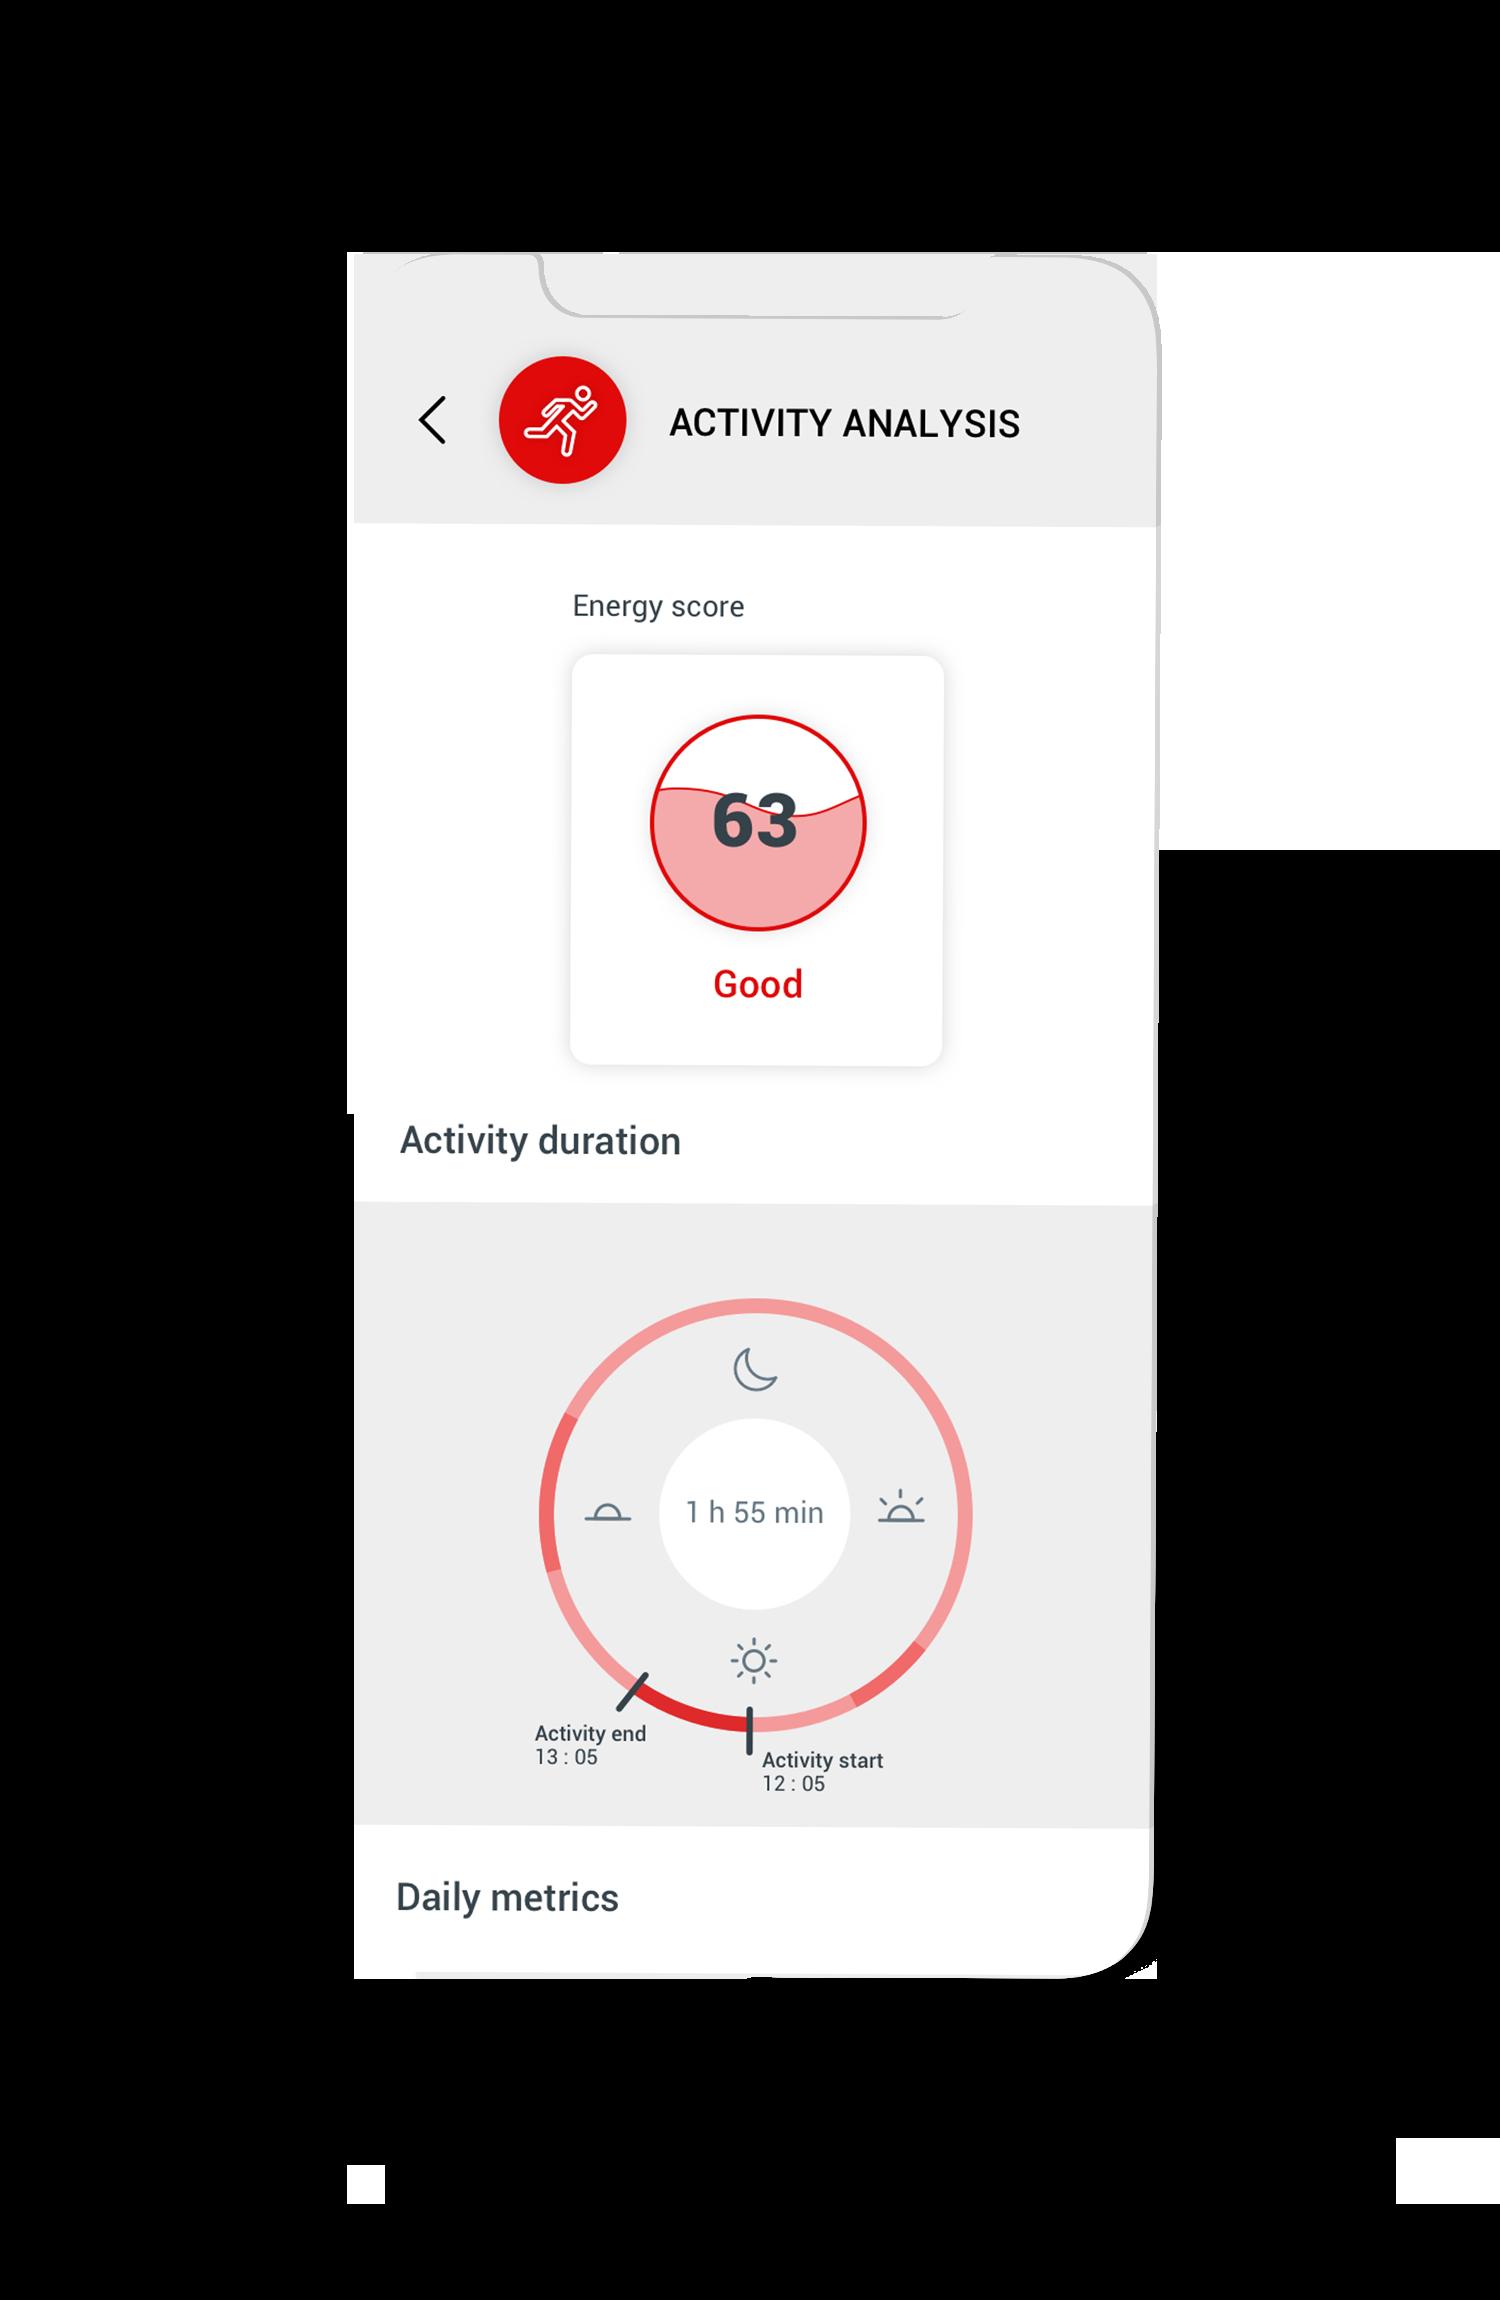 Energy score on the Circular app